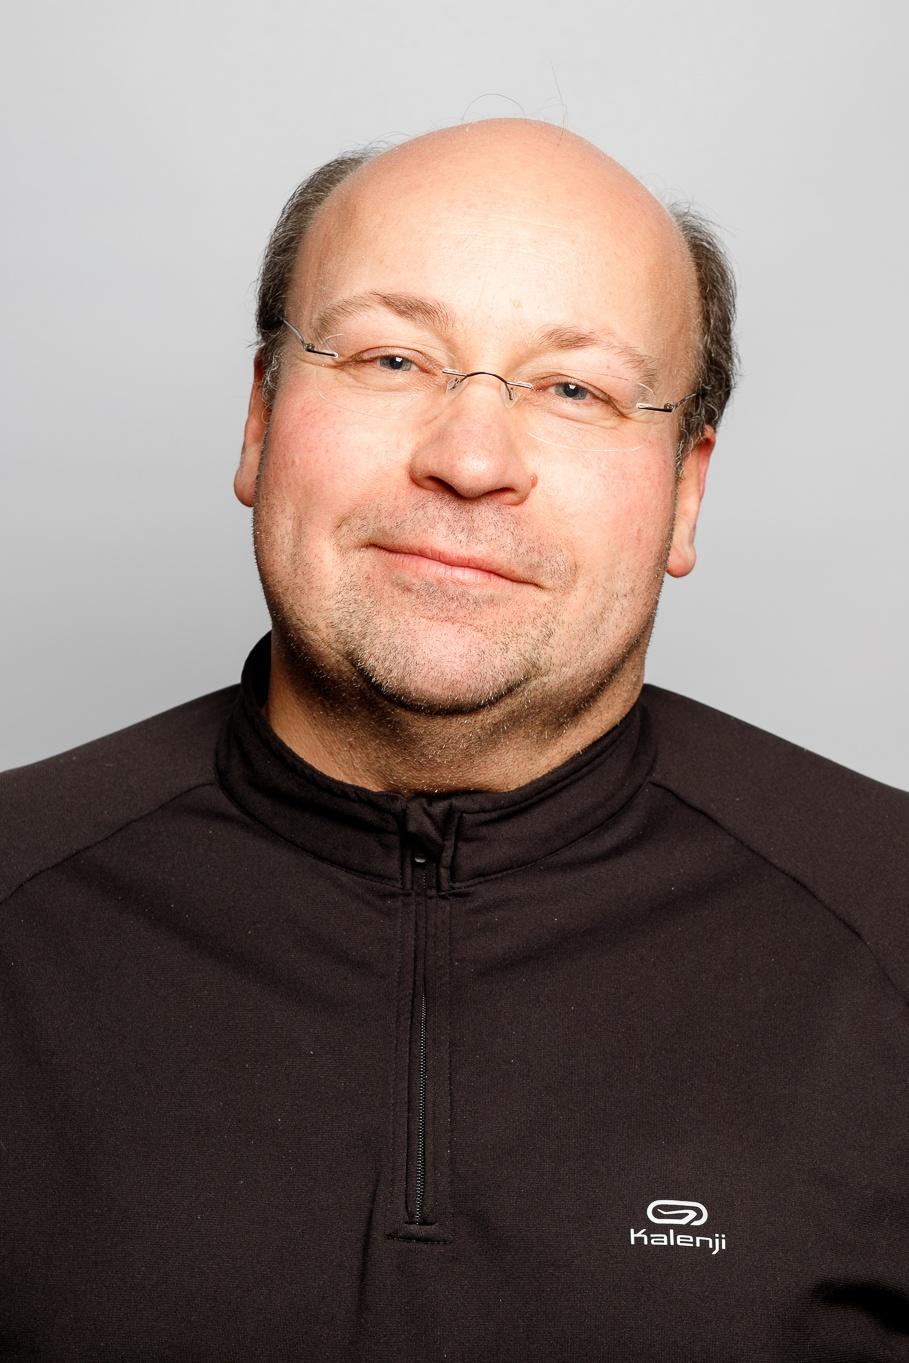 Portraitfoto Michael Gnadke - 2. Vorsitzender / Sponsoring